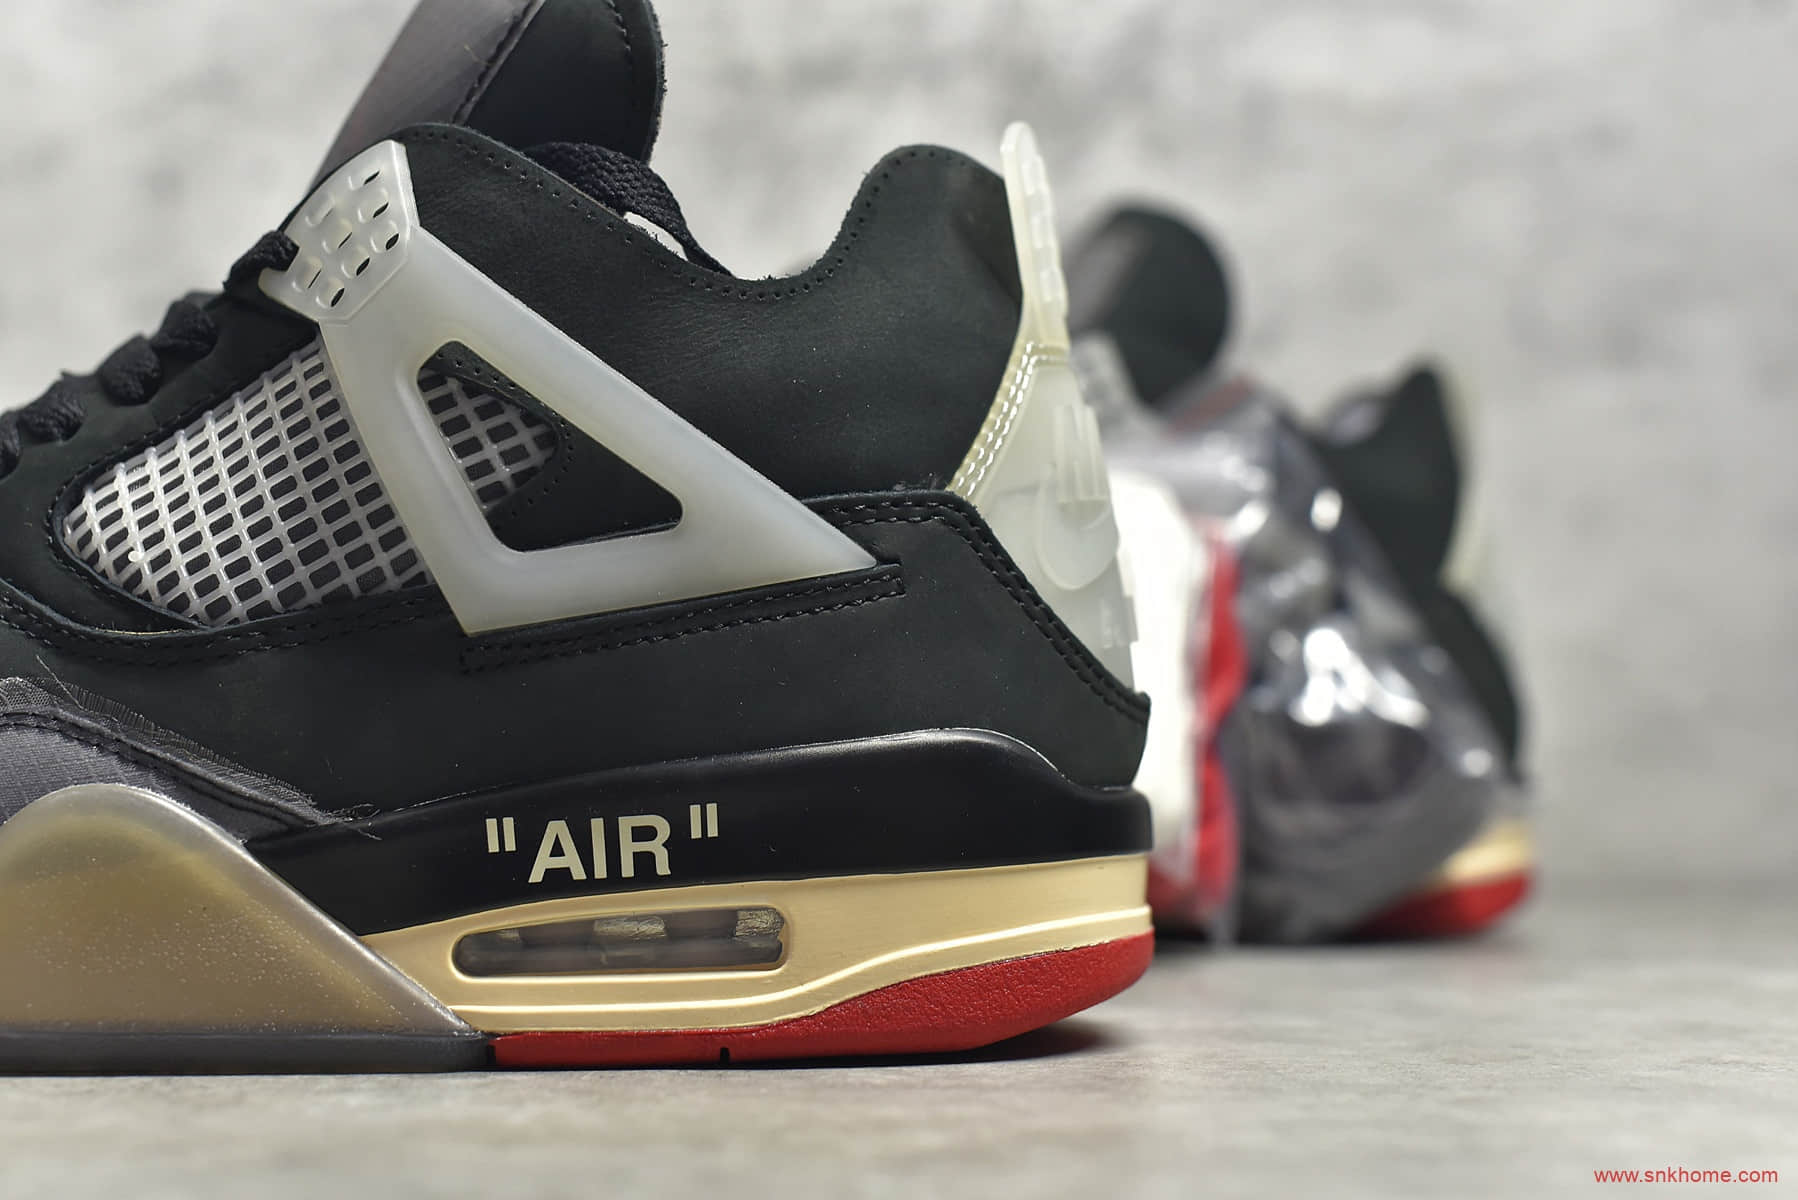 AJ4OW联名蝉翼黑灰红 Off-White x Air Jordan AJ4 Retro Cream Sail 黑灰色AJ4球鞋 货号:CV9388-001-潮流者之家